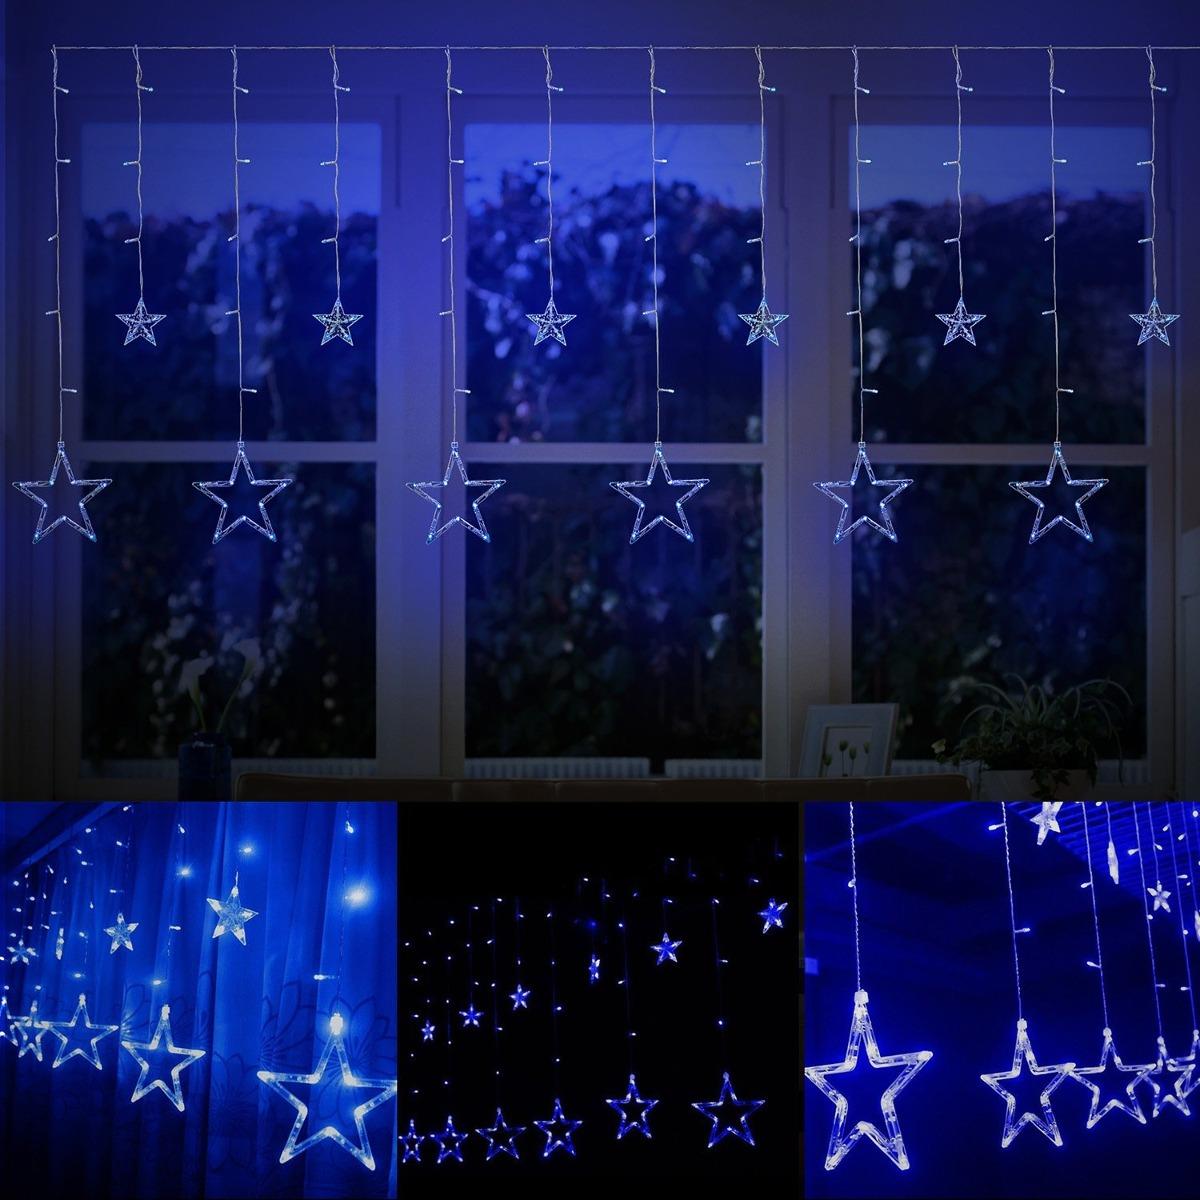 c25b6fff732 12 Estrellas 138 Led Cortina Cadena Luces Para Navidad-azul ...